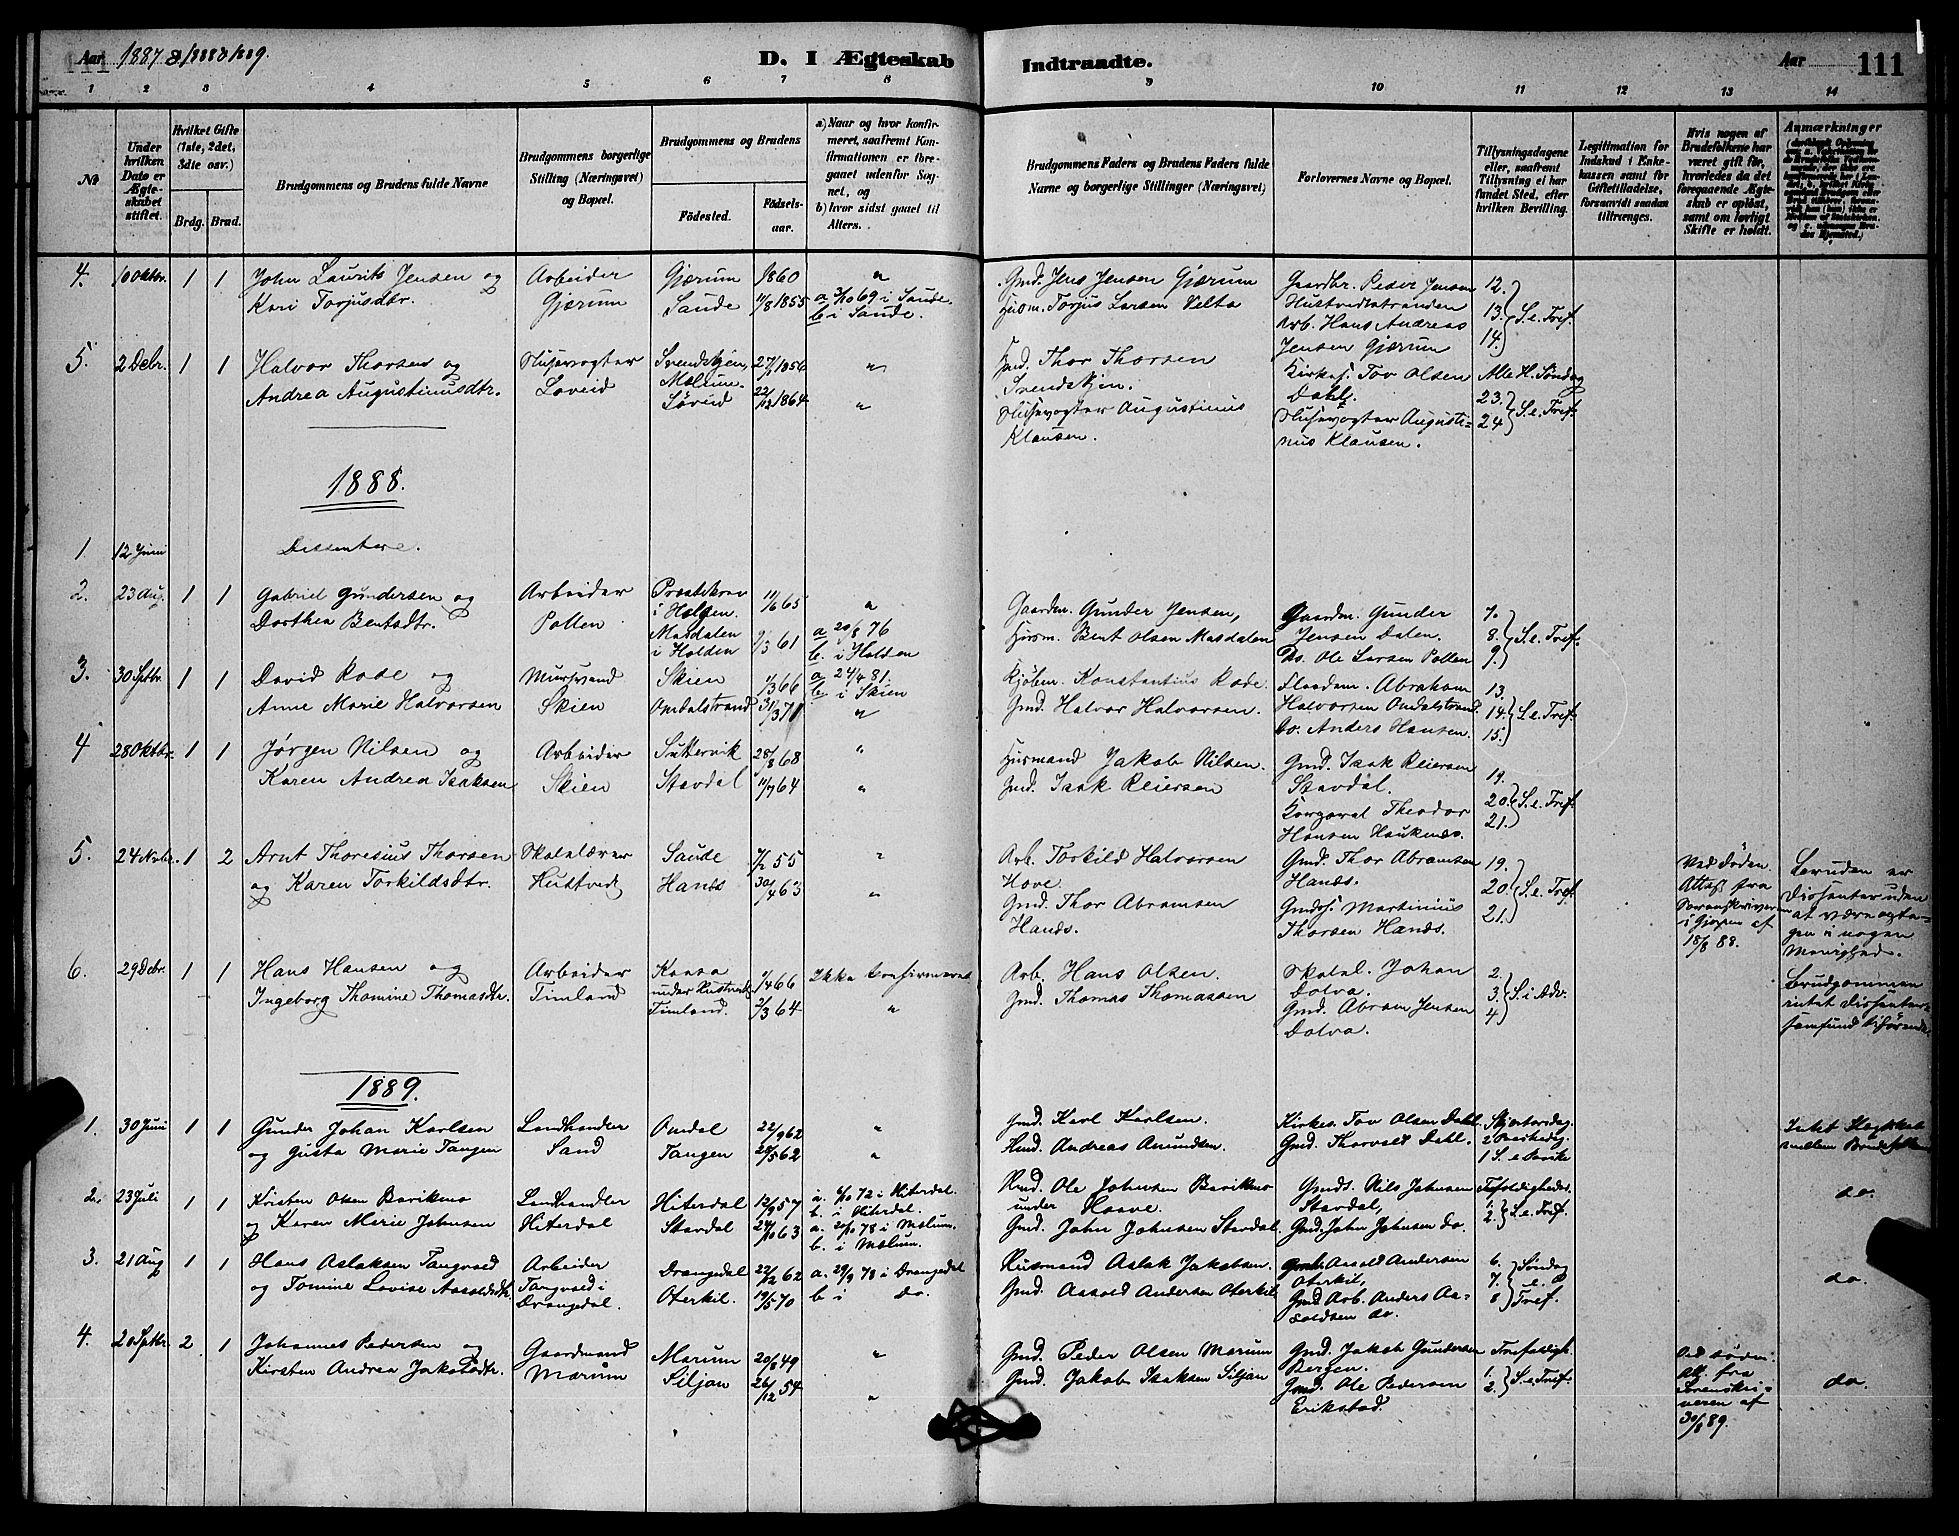 SAKO, Solum kirkebøker, G/Gb/L0003: Klokkerbok nr. II 3, 1880-1898, s. 111